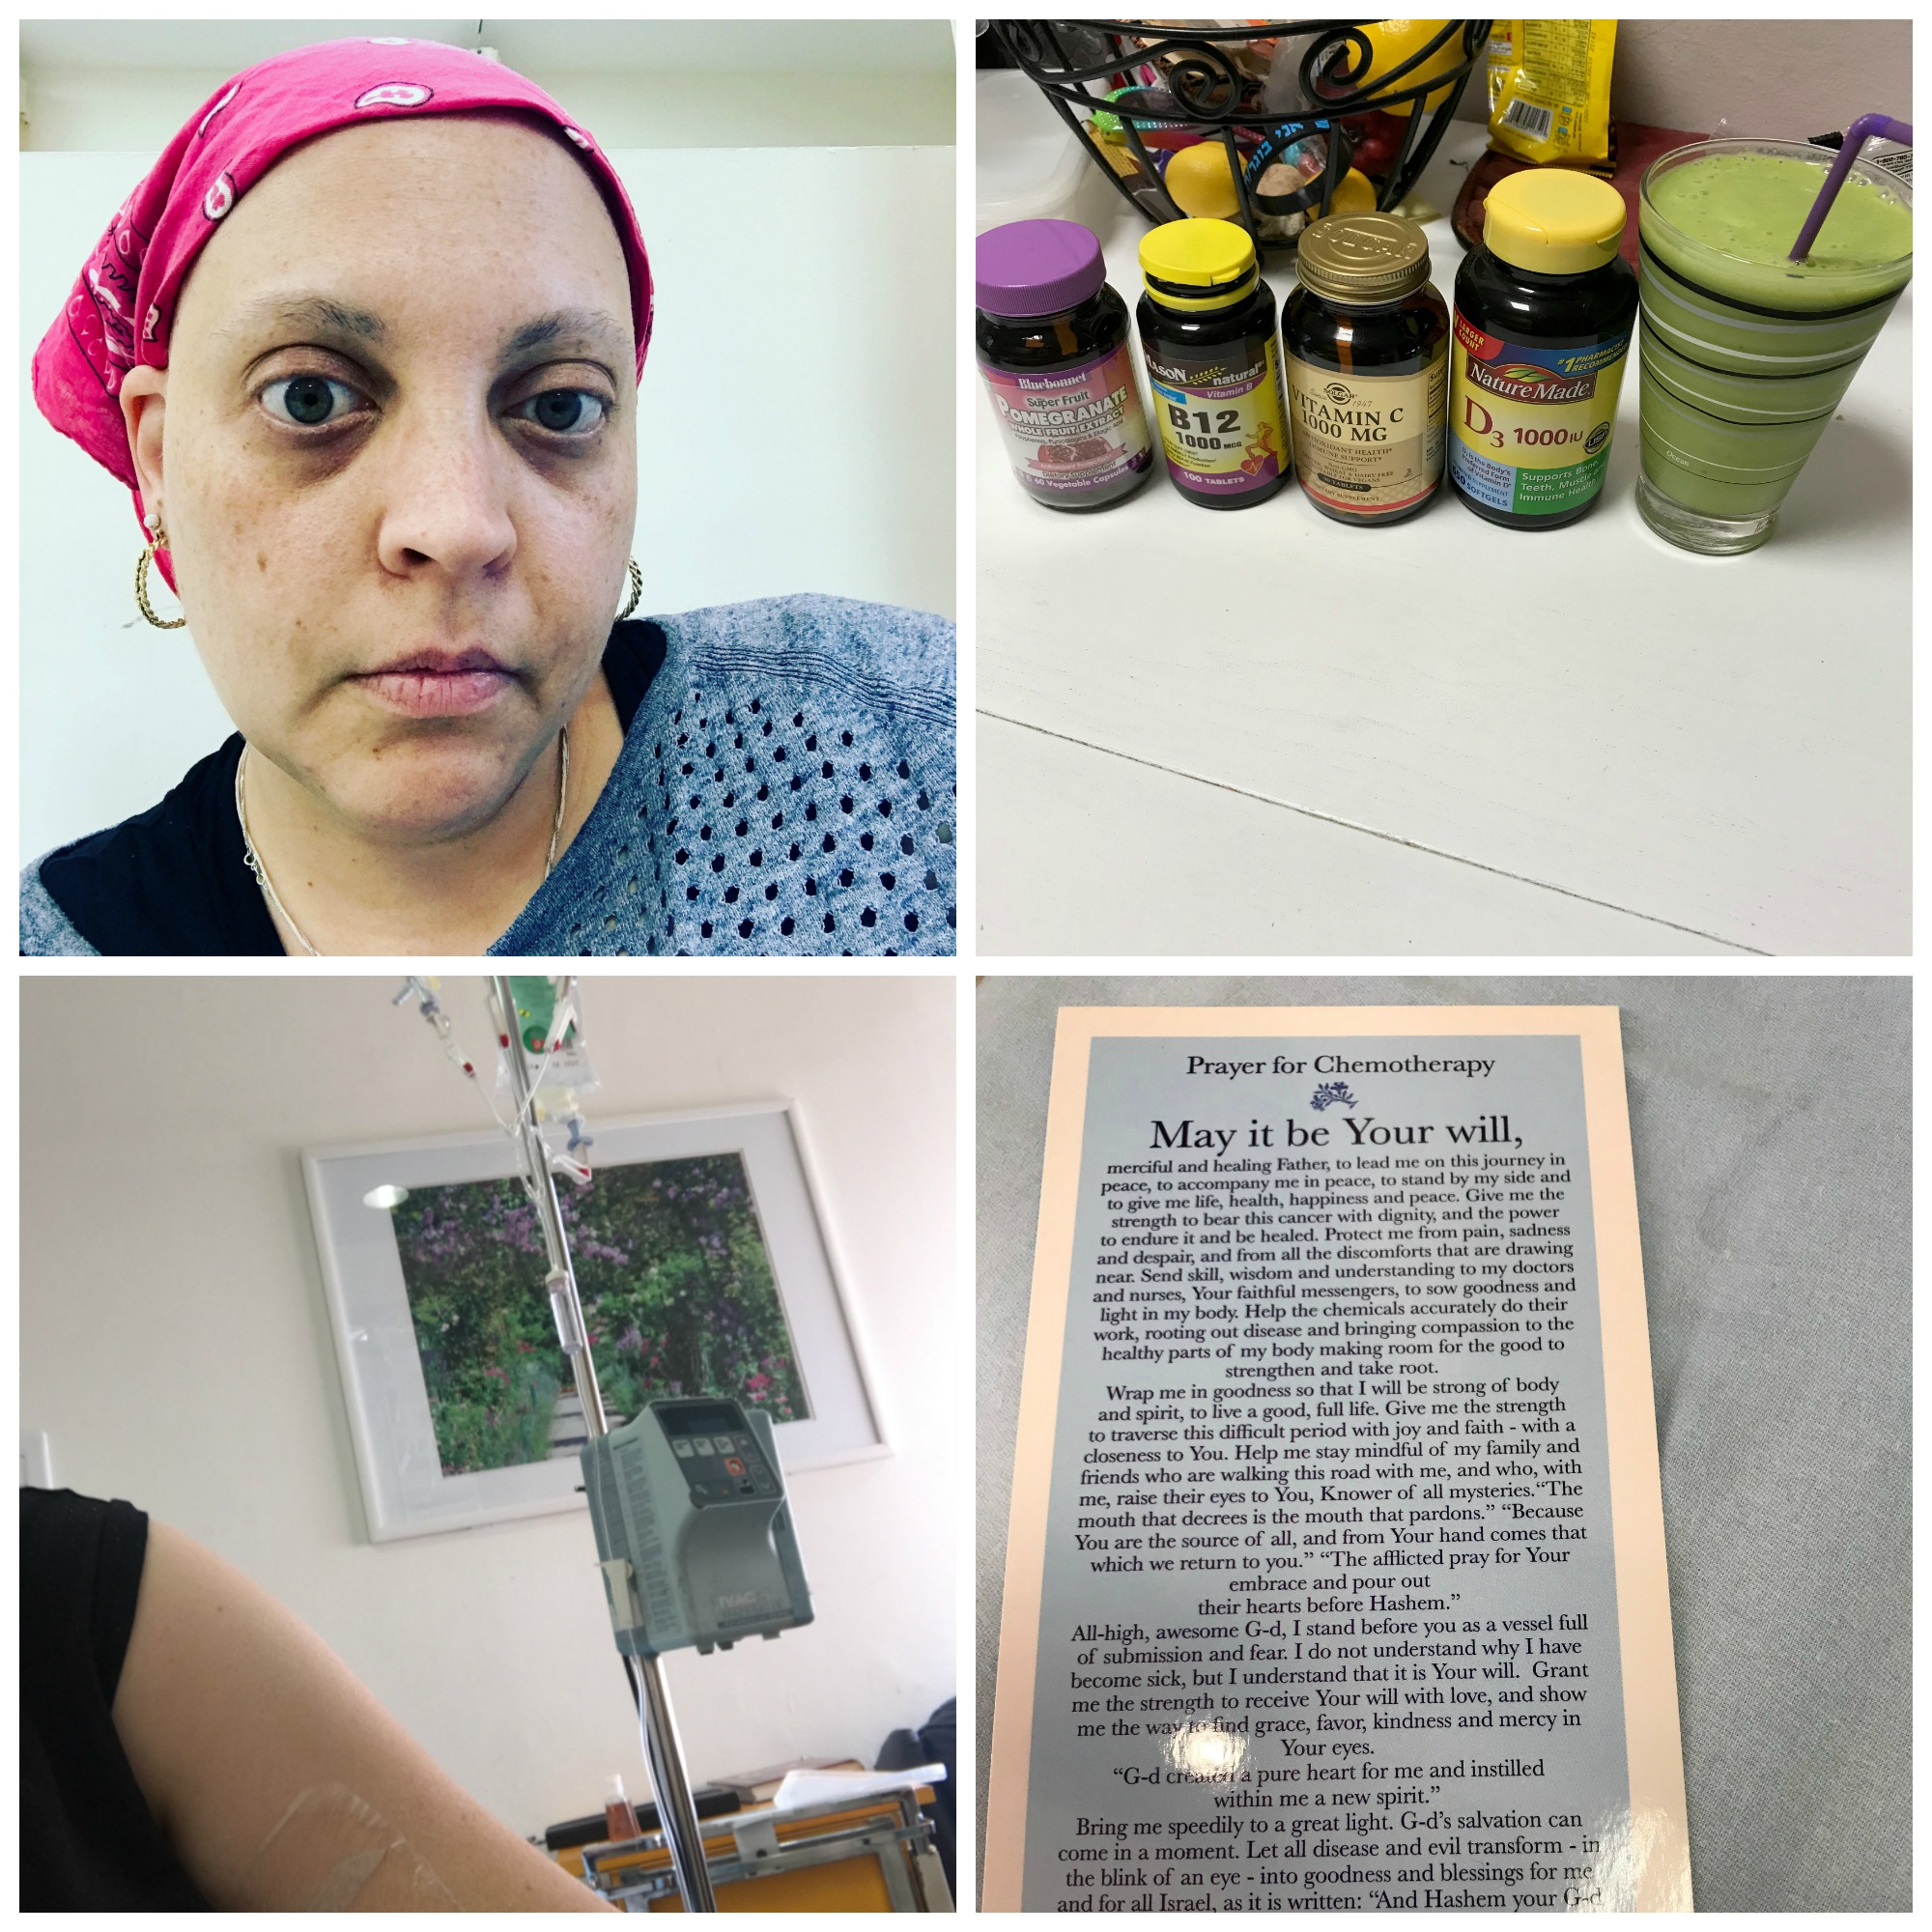 Treatment #5